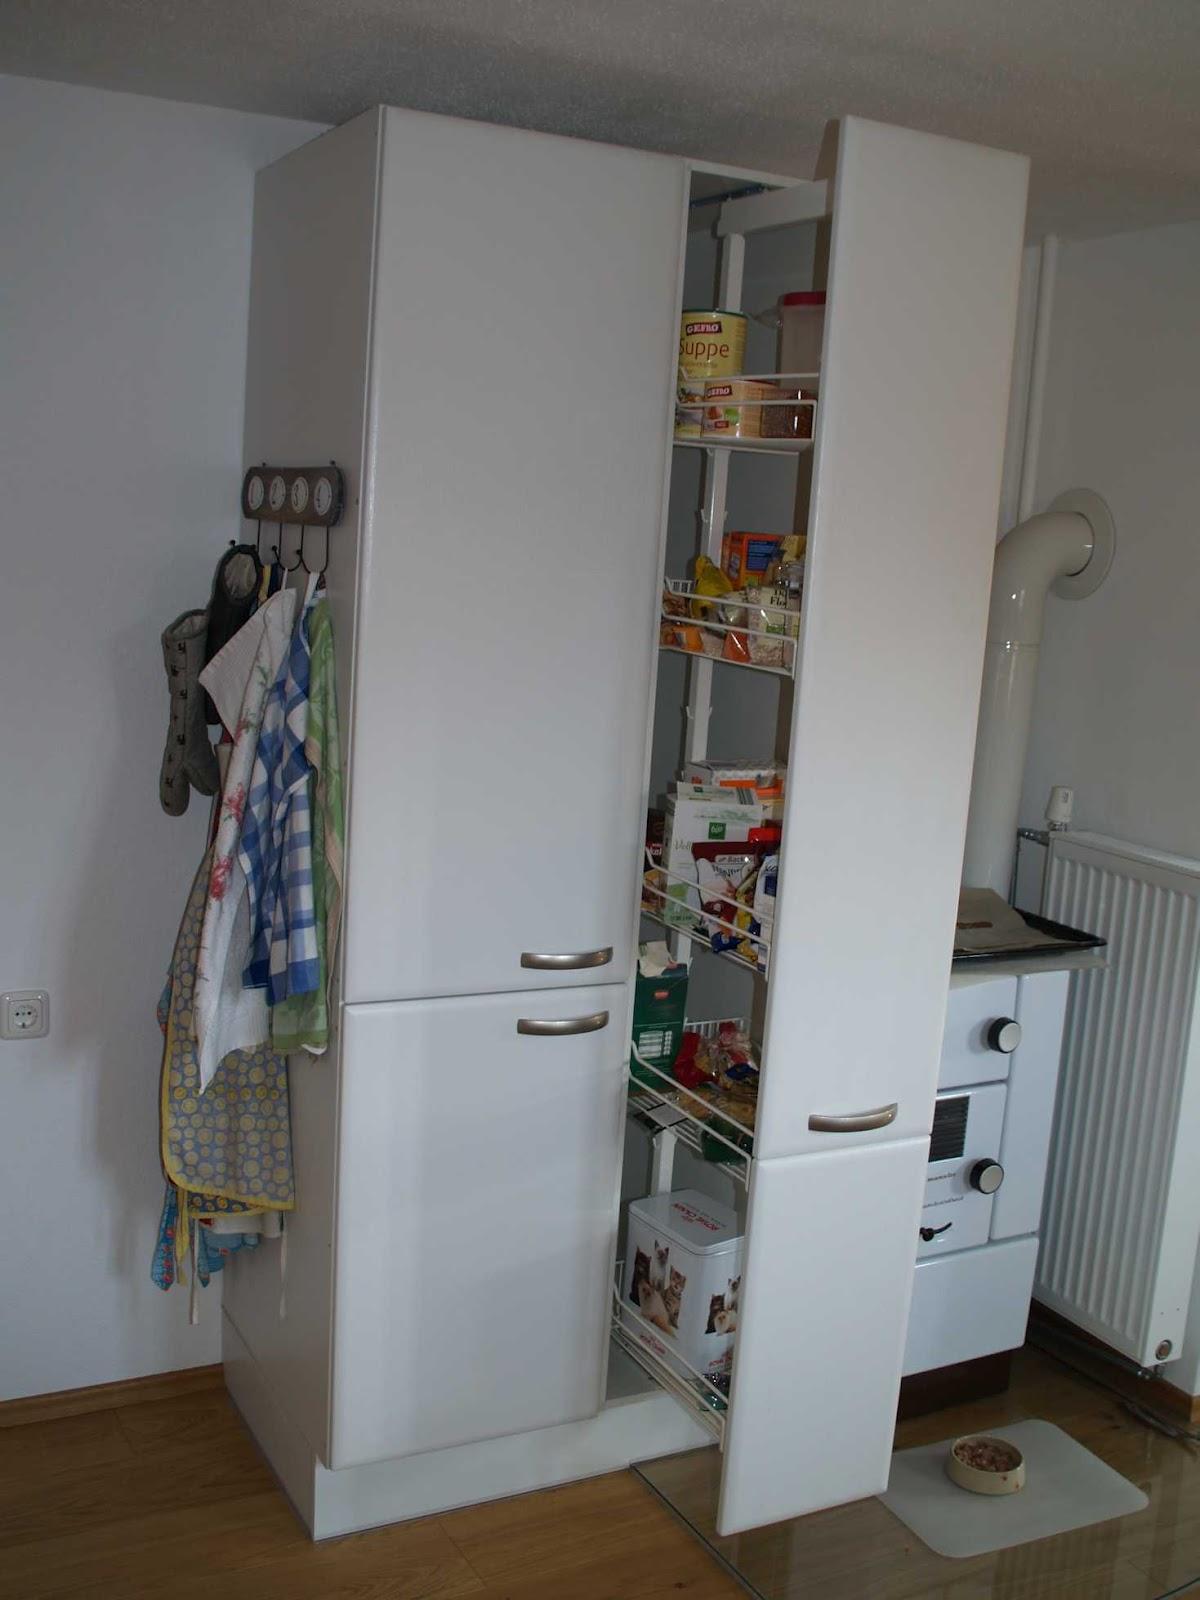 maschensalat m rz 2012. Black Bedroom Furniture Sets. Home Design Ideas